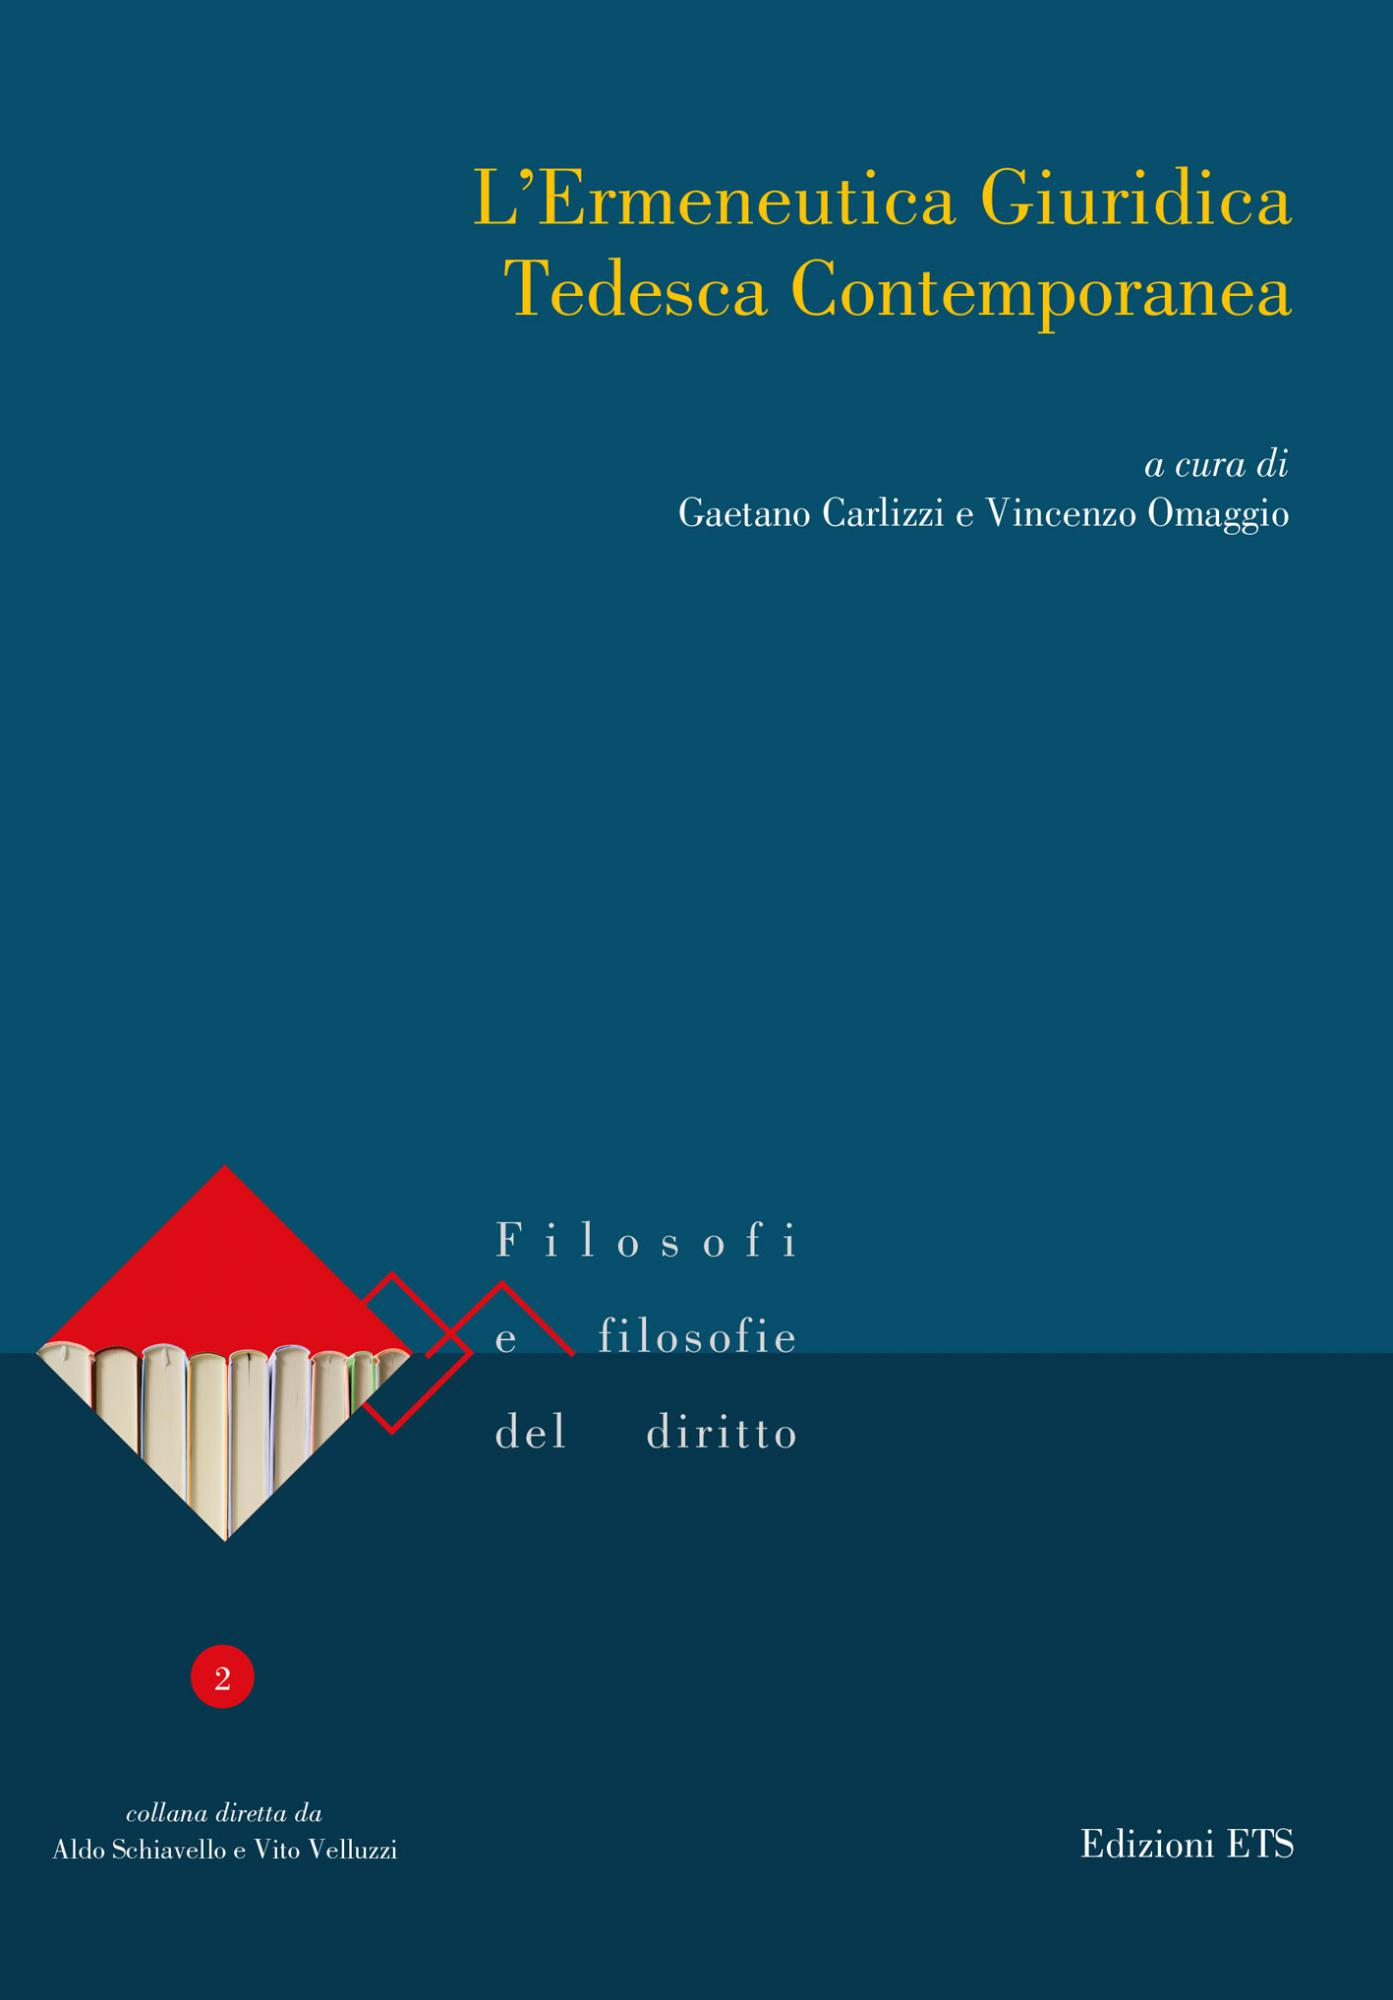 L'Ermeneutica Giuridica Tedesca Contemporanea